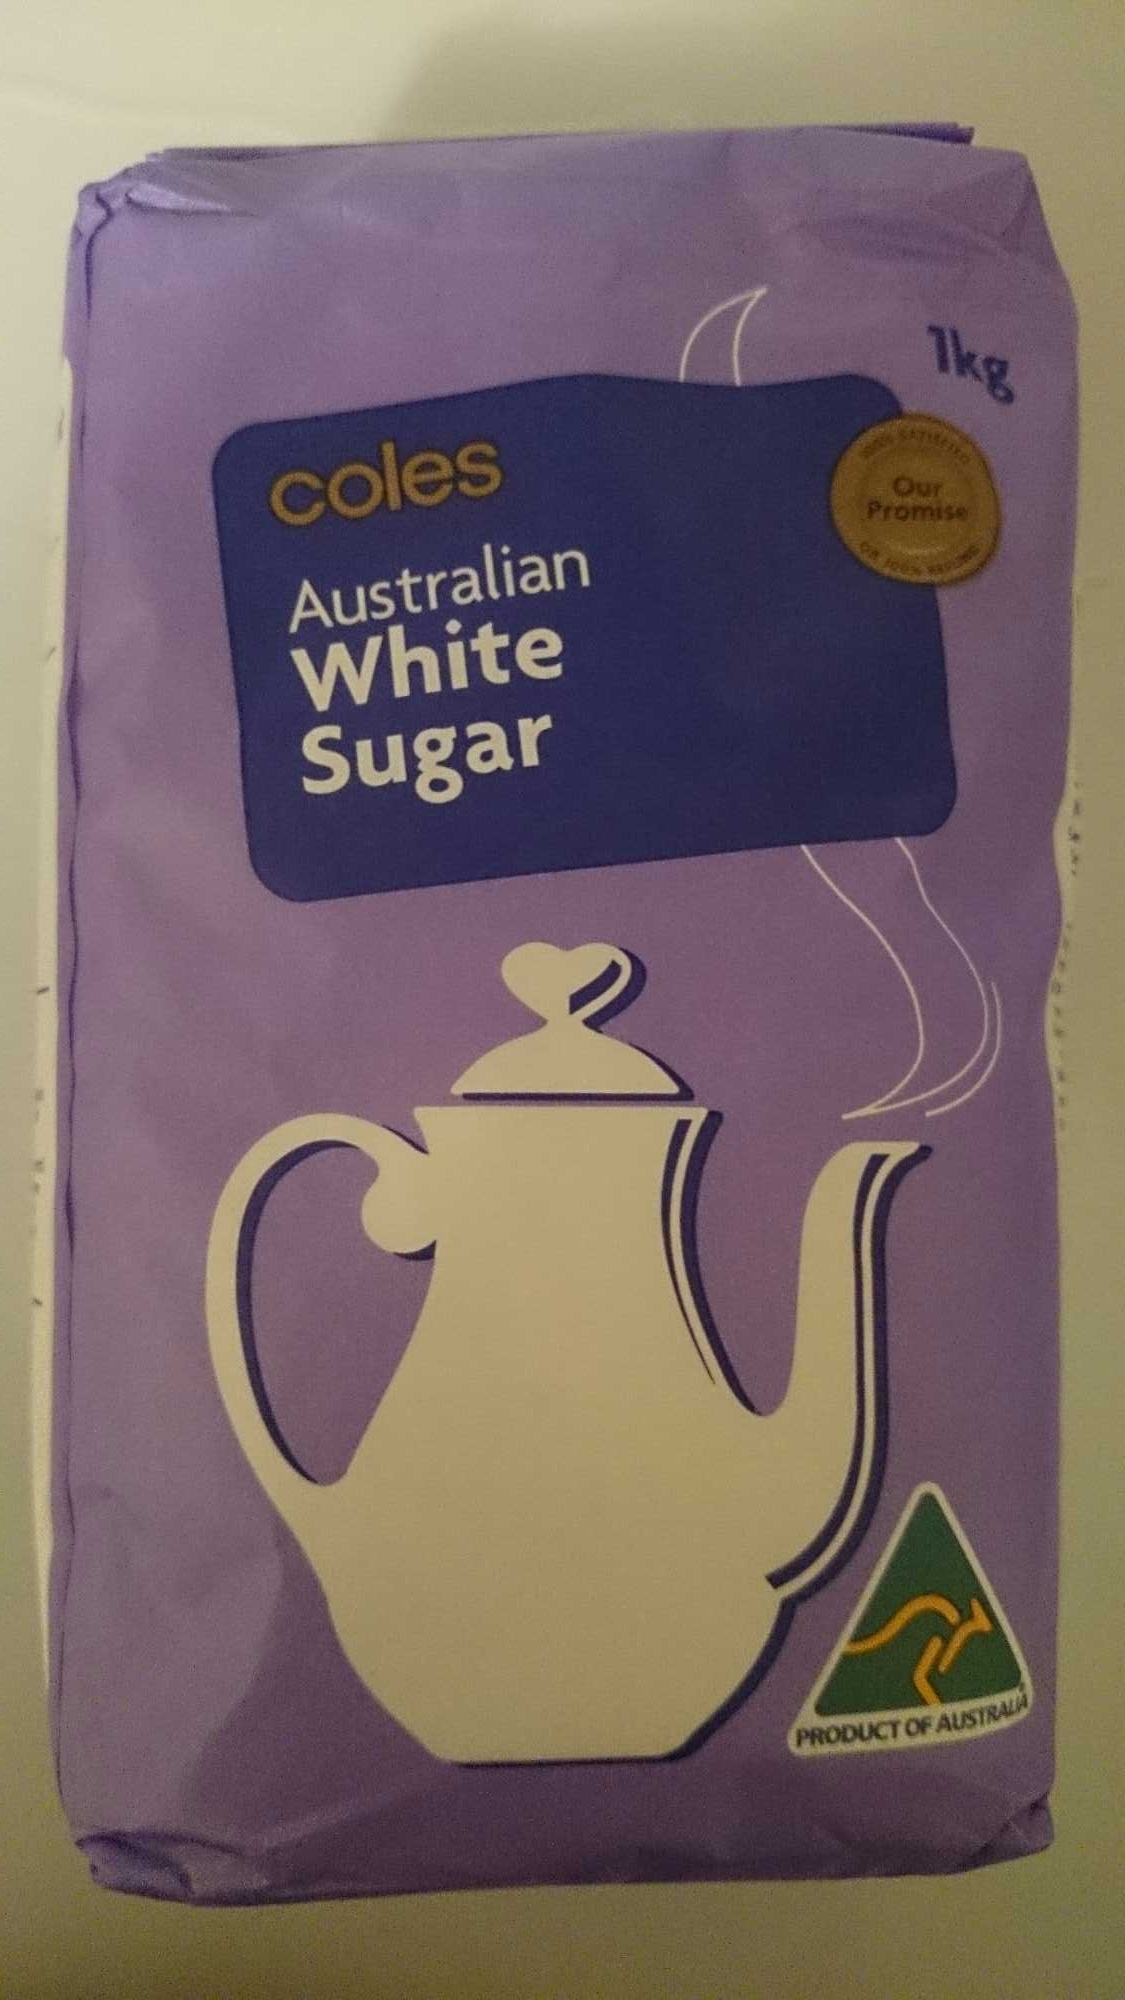 Australian White Sugar - Product